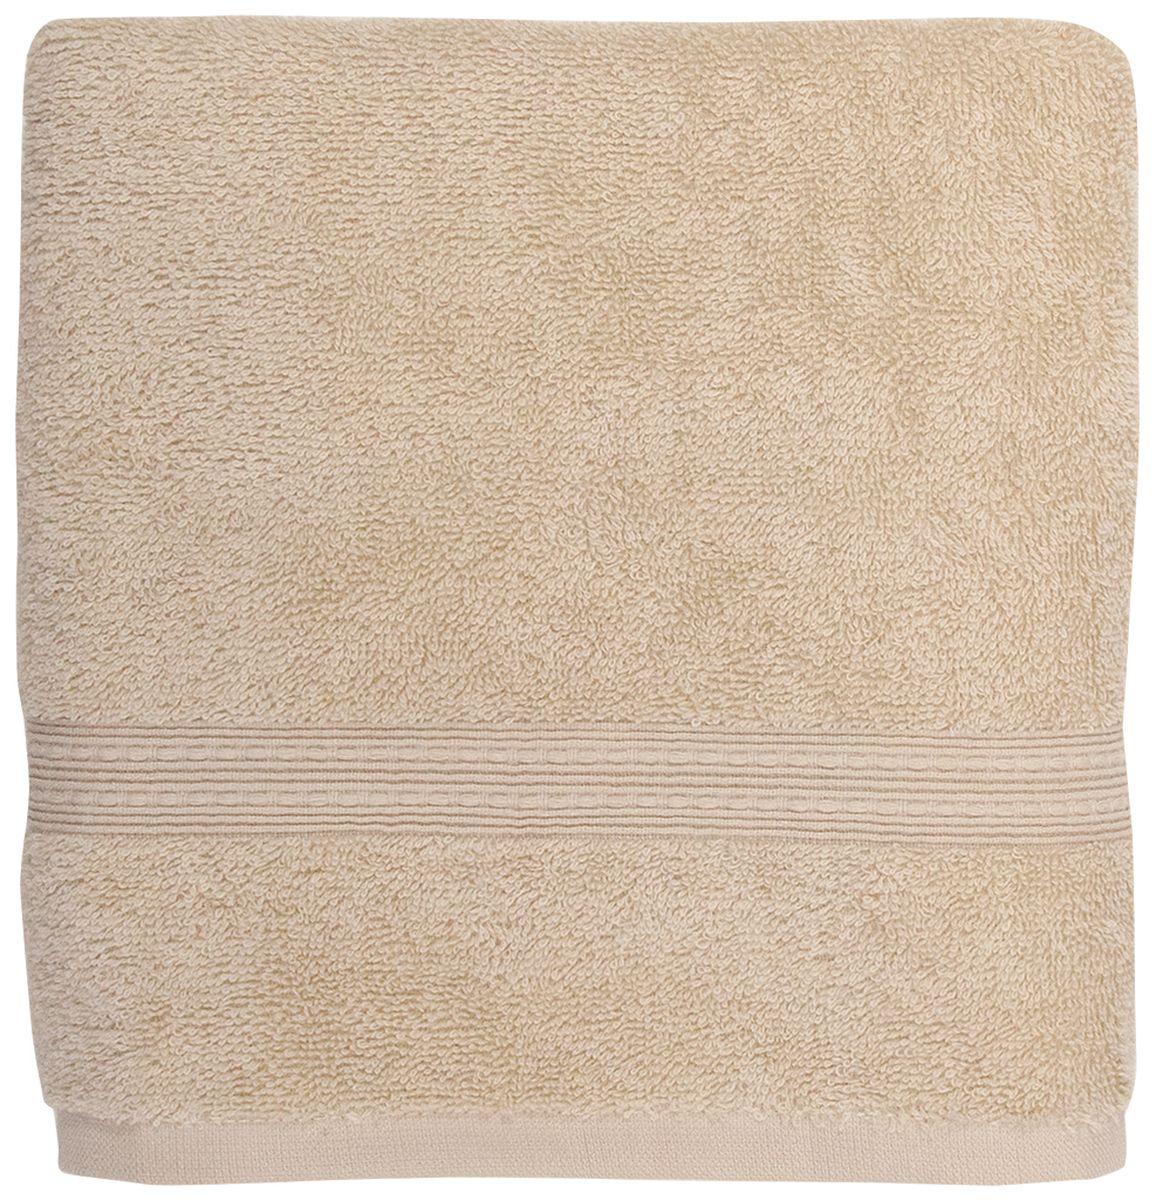 Полотенце банное Bonita Classic, махровое, цвет: бисквит, 50 x 90 см1011217216Полотенце банное 50*90 Bonita Classic, махровое